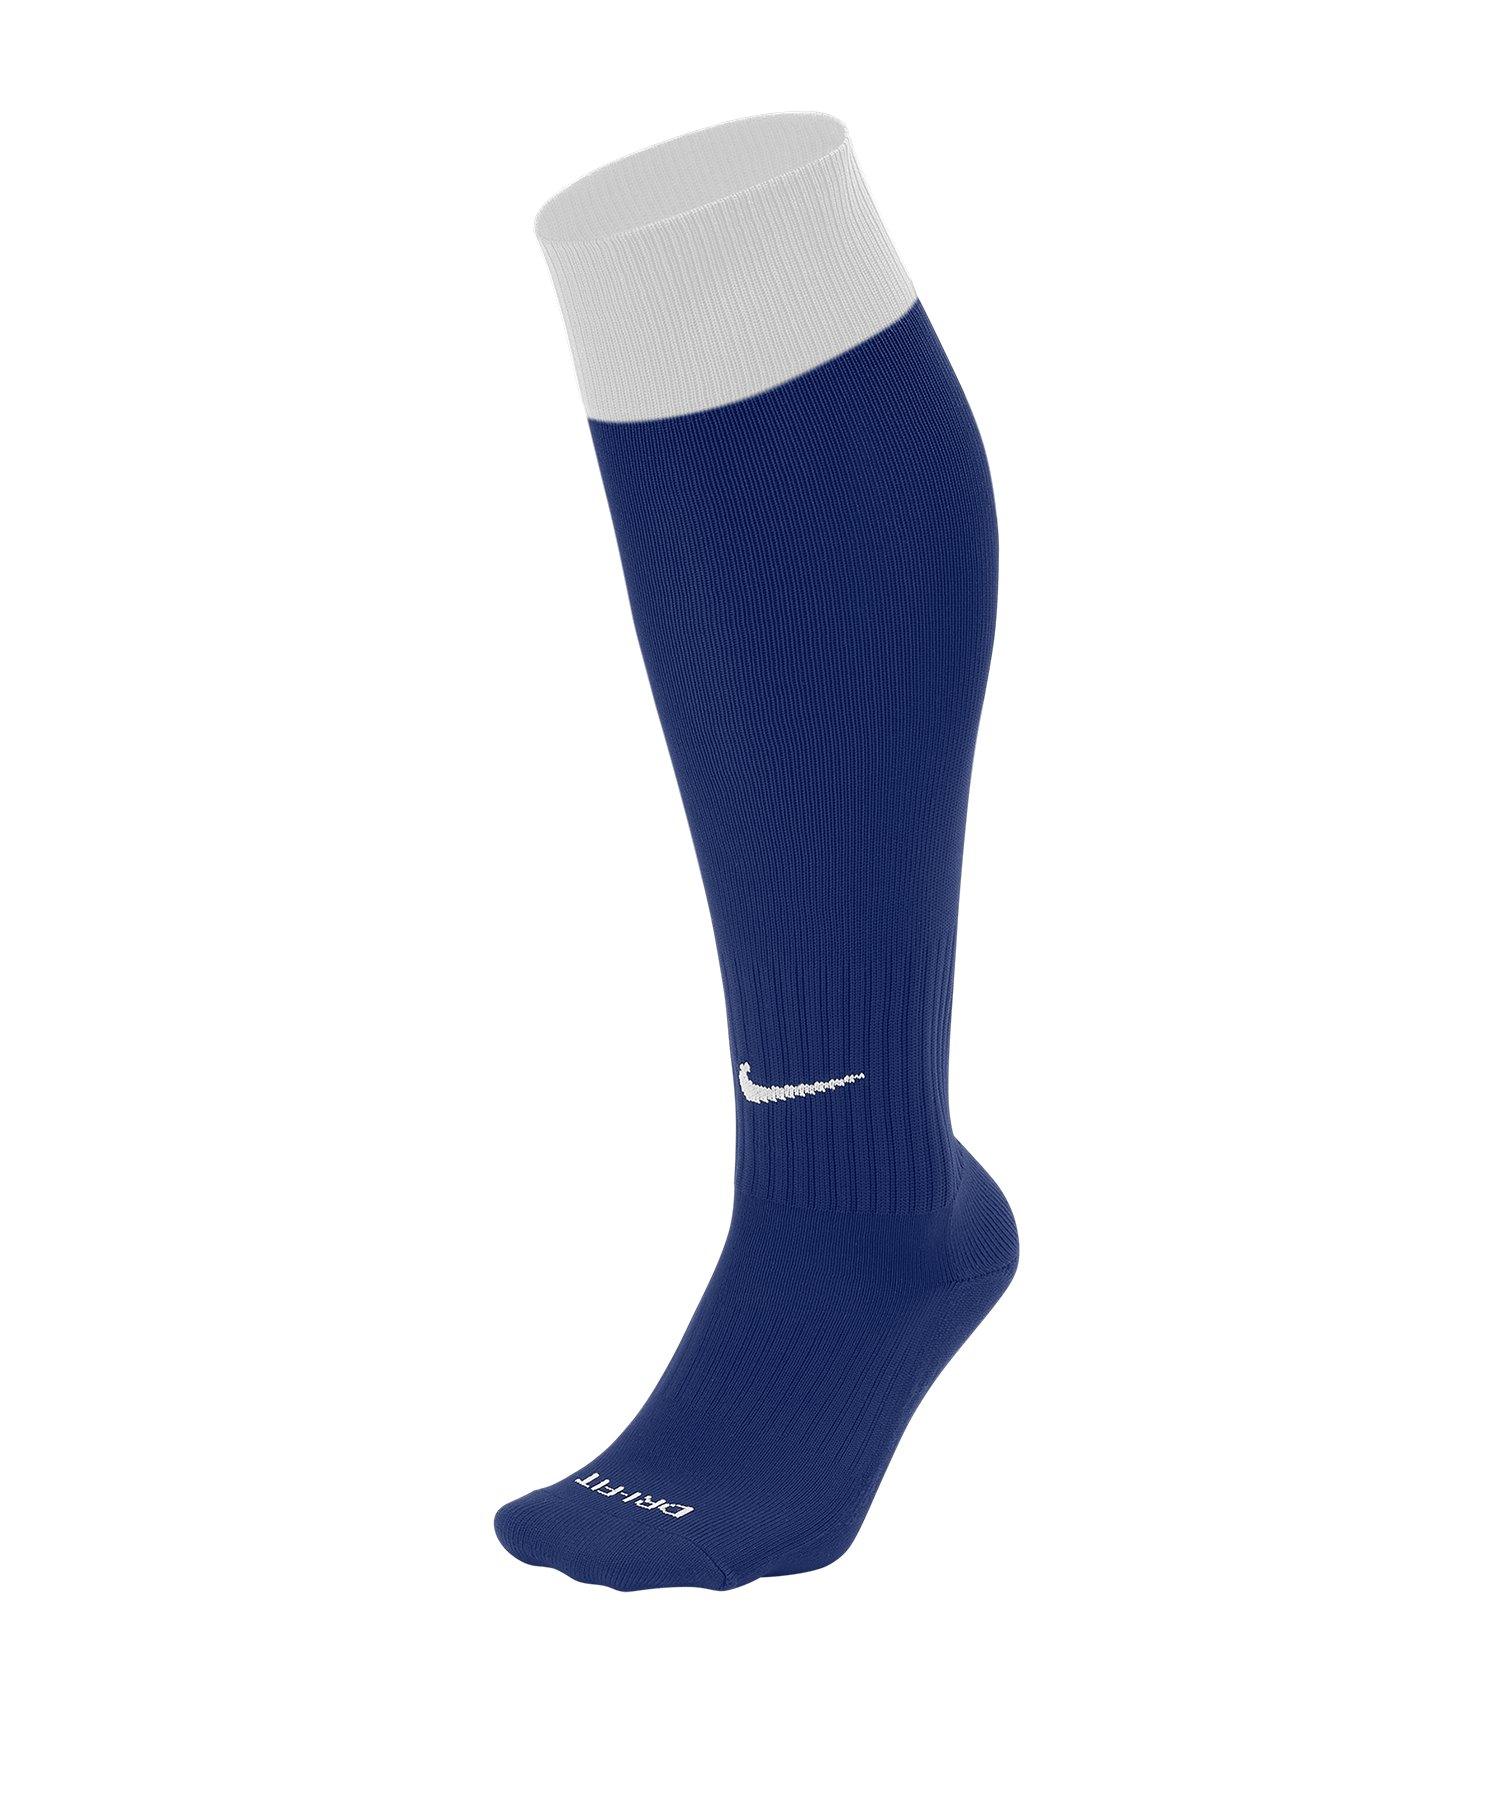 Nike Classic II 2.0 Team Stutzen Blau F463 - blau